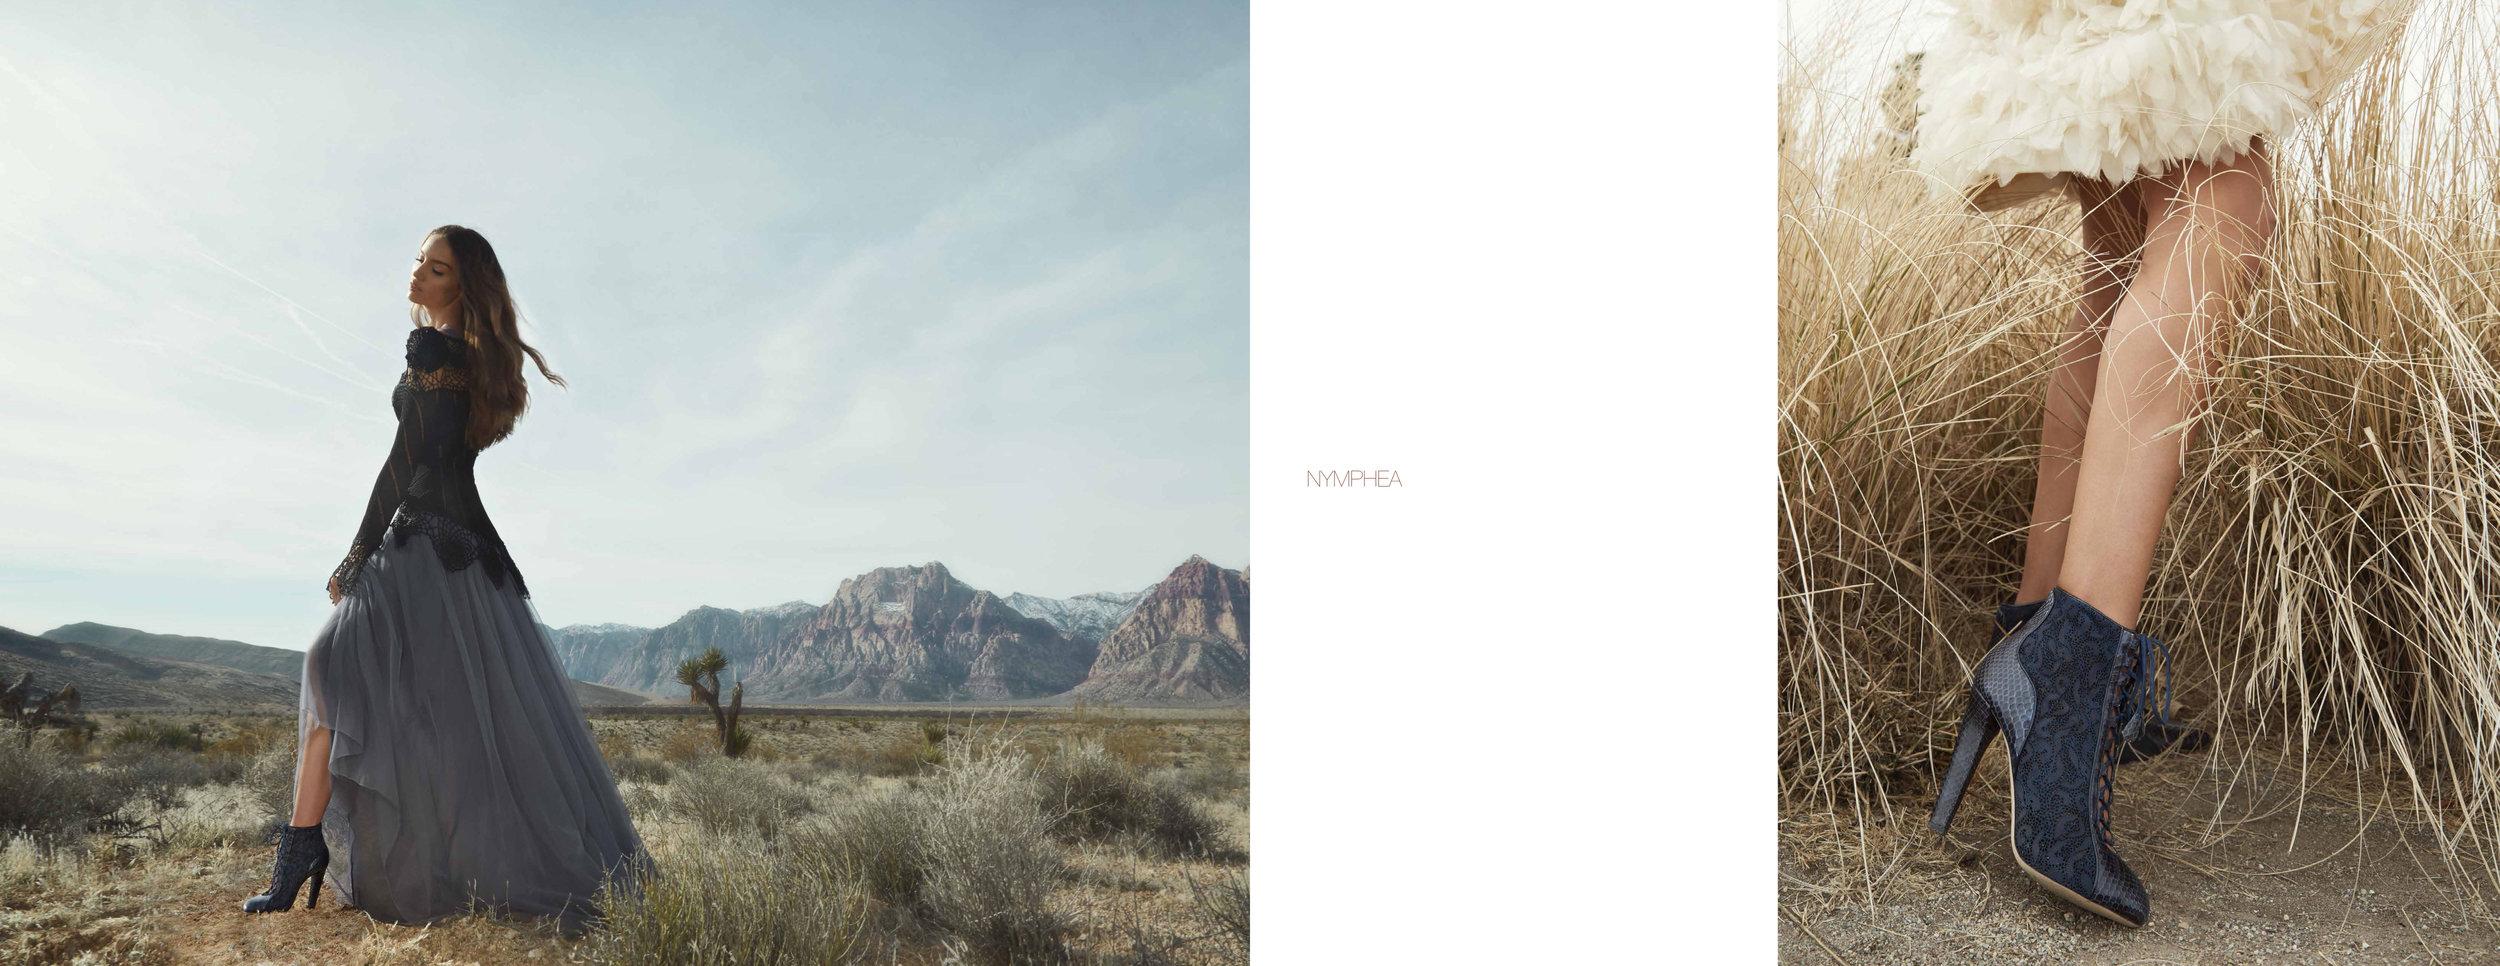 ChloeGosselin-FW17-lookbook1-5.jpg